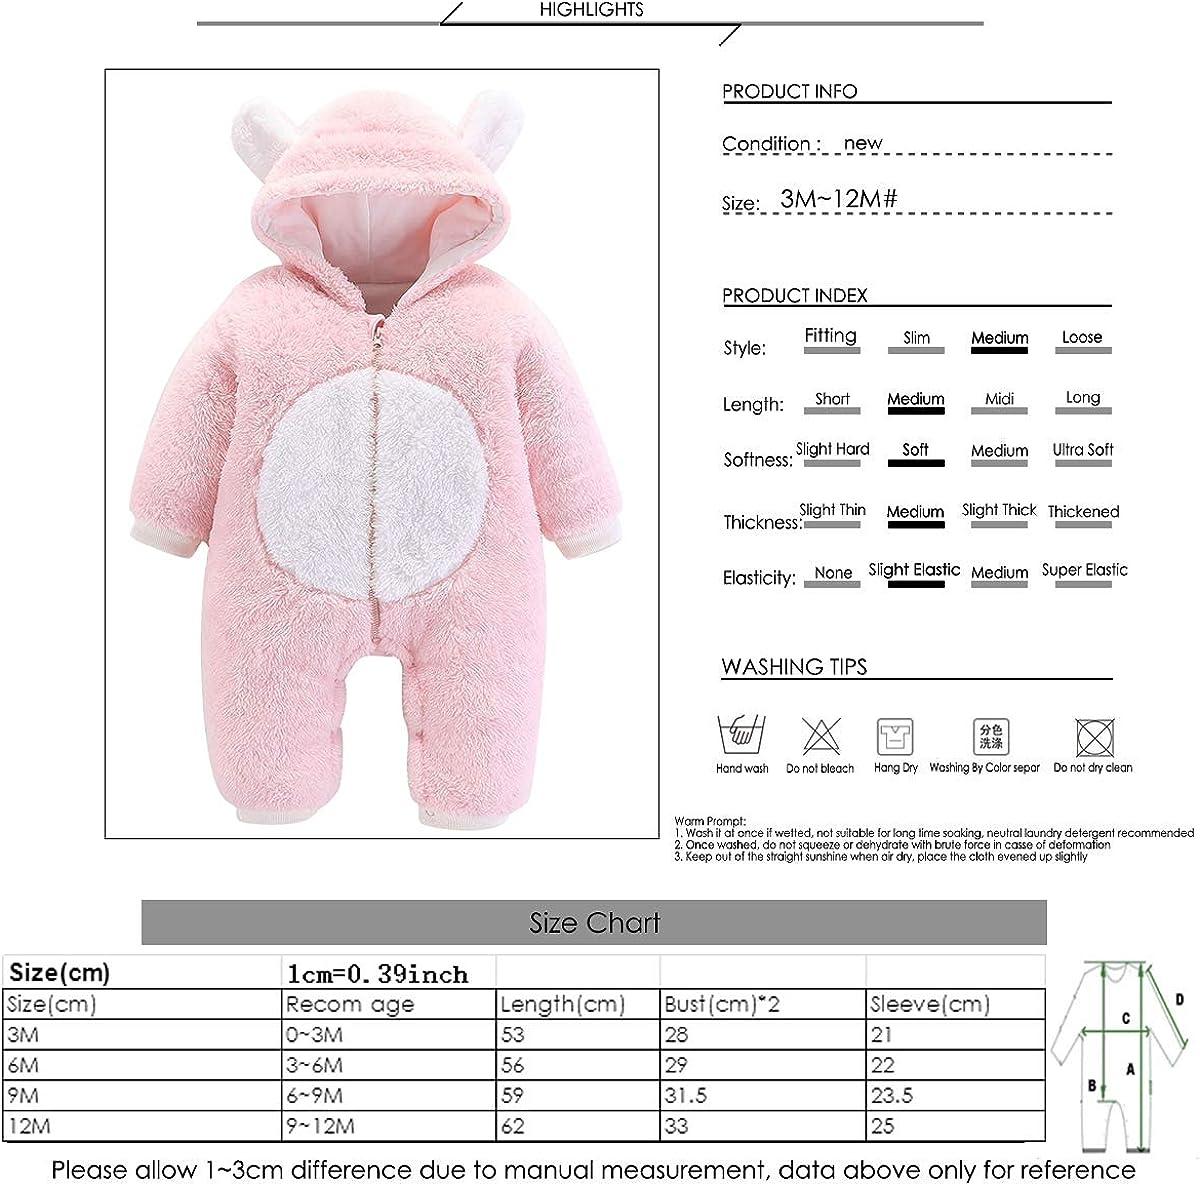 greatmtx Neugeborenes Baby Strampler Outfit Langarm Coral Fleece Kapuze Overall Bodysuit f/ür 0-12 Monate